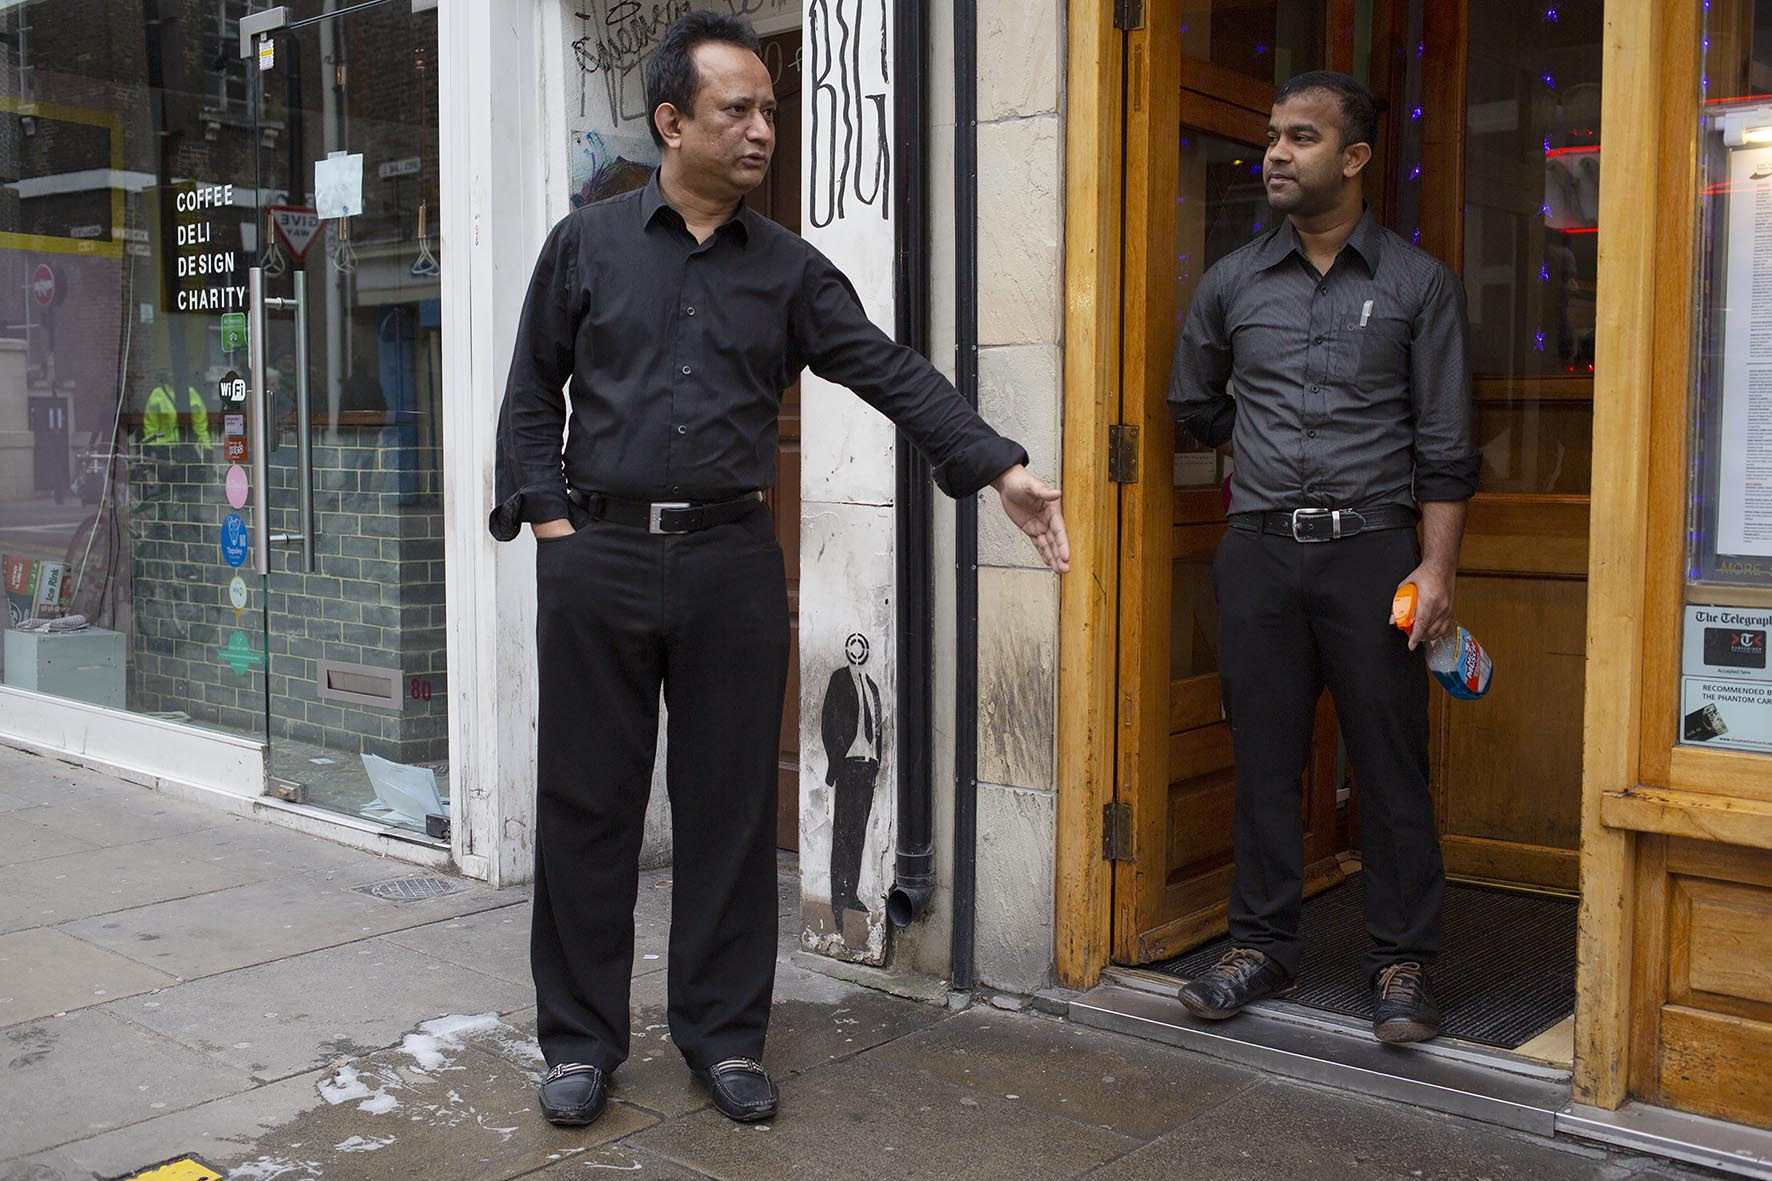 20151230_brick lane restaurant owners_A.jpg